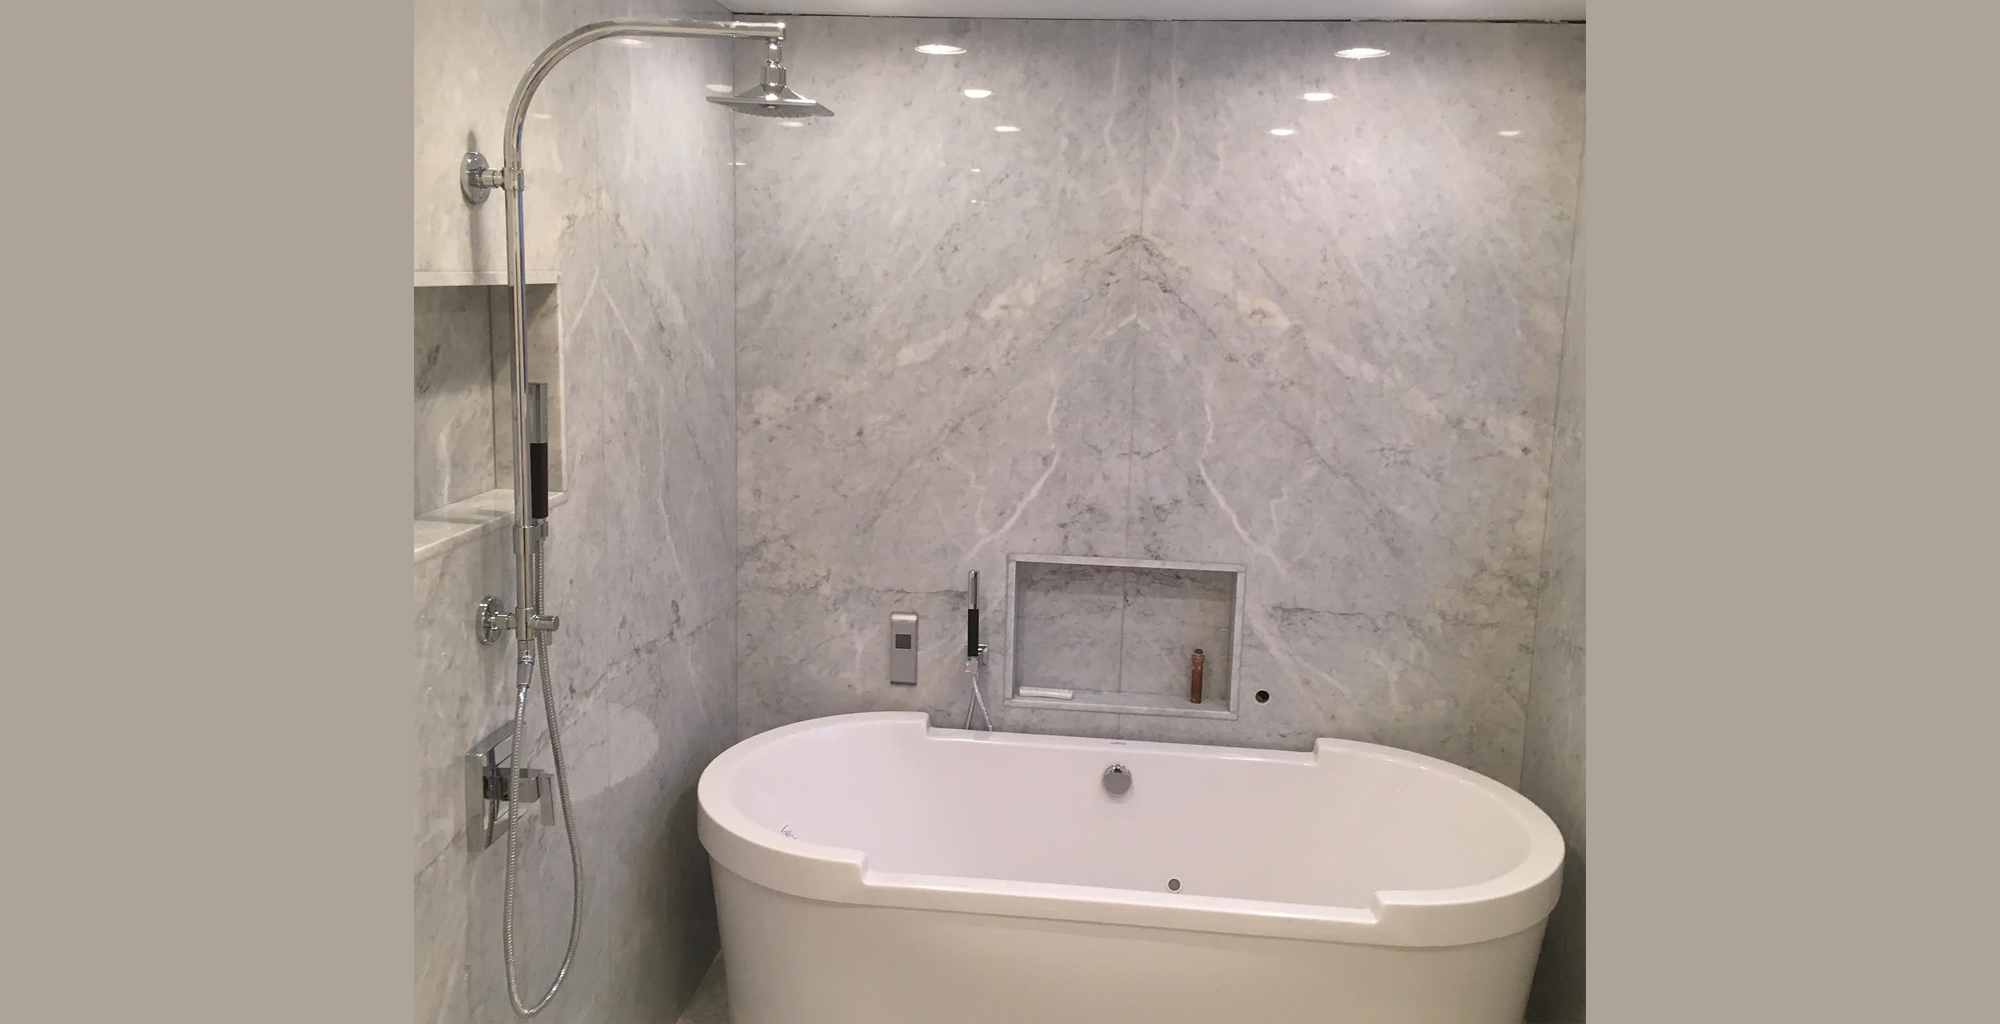 Week 6 bathroom renovation | Sam Kellogg